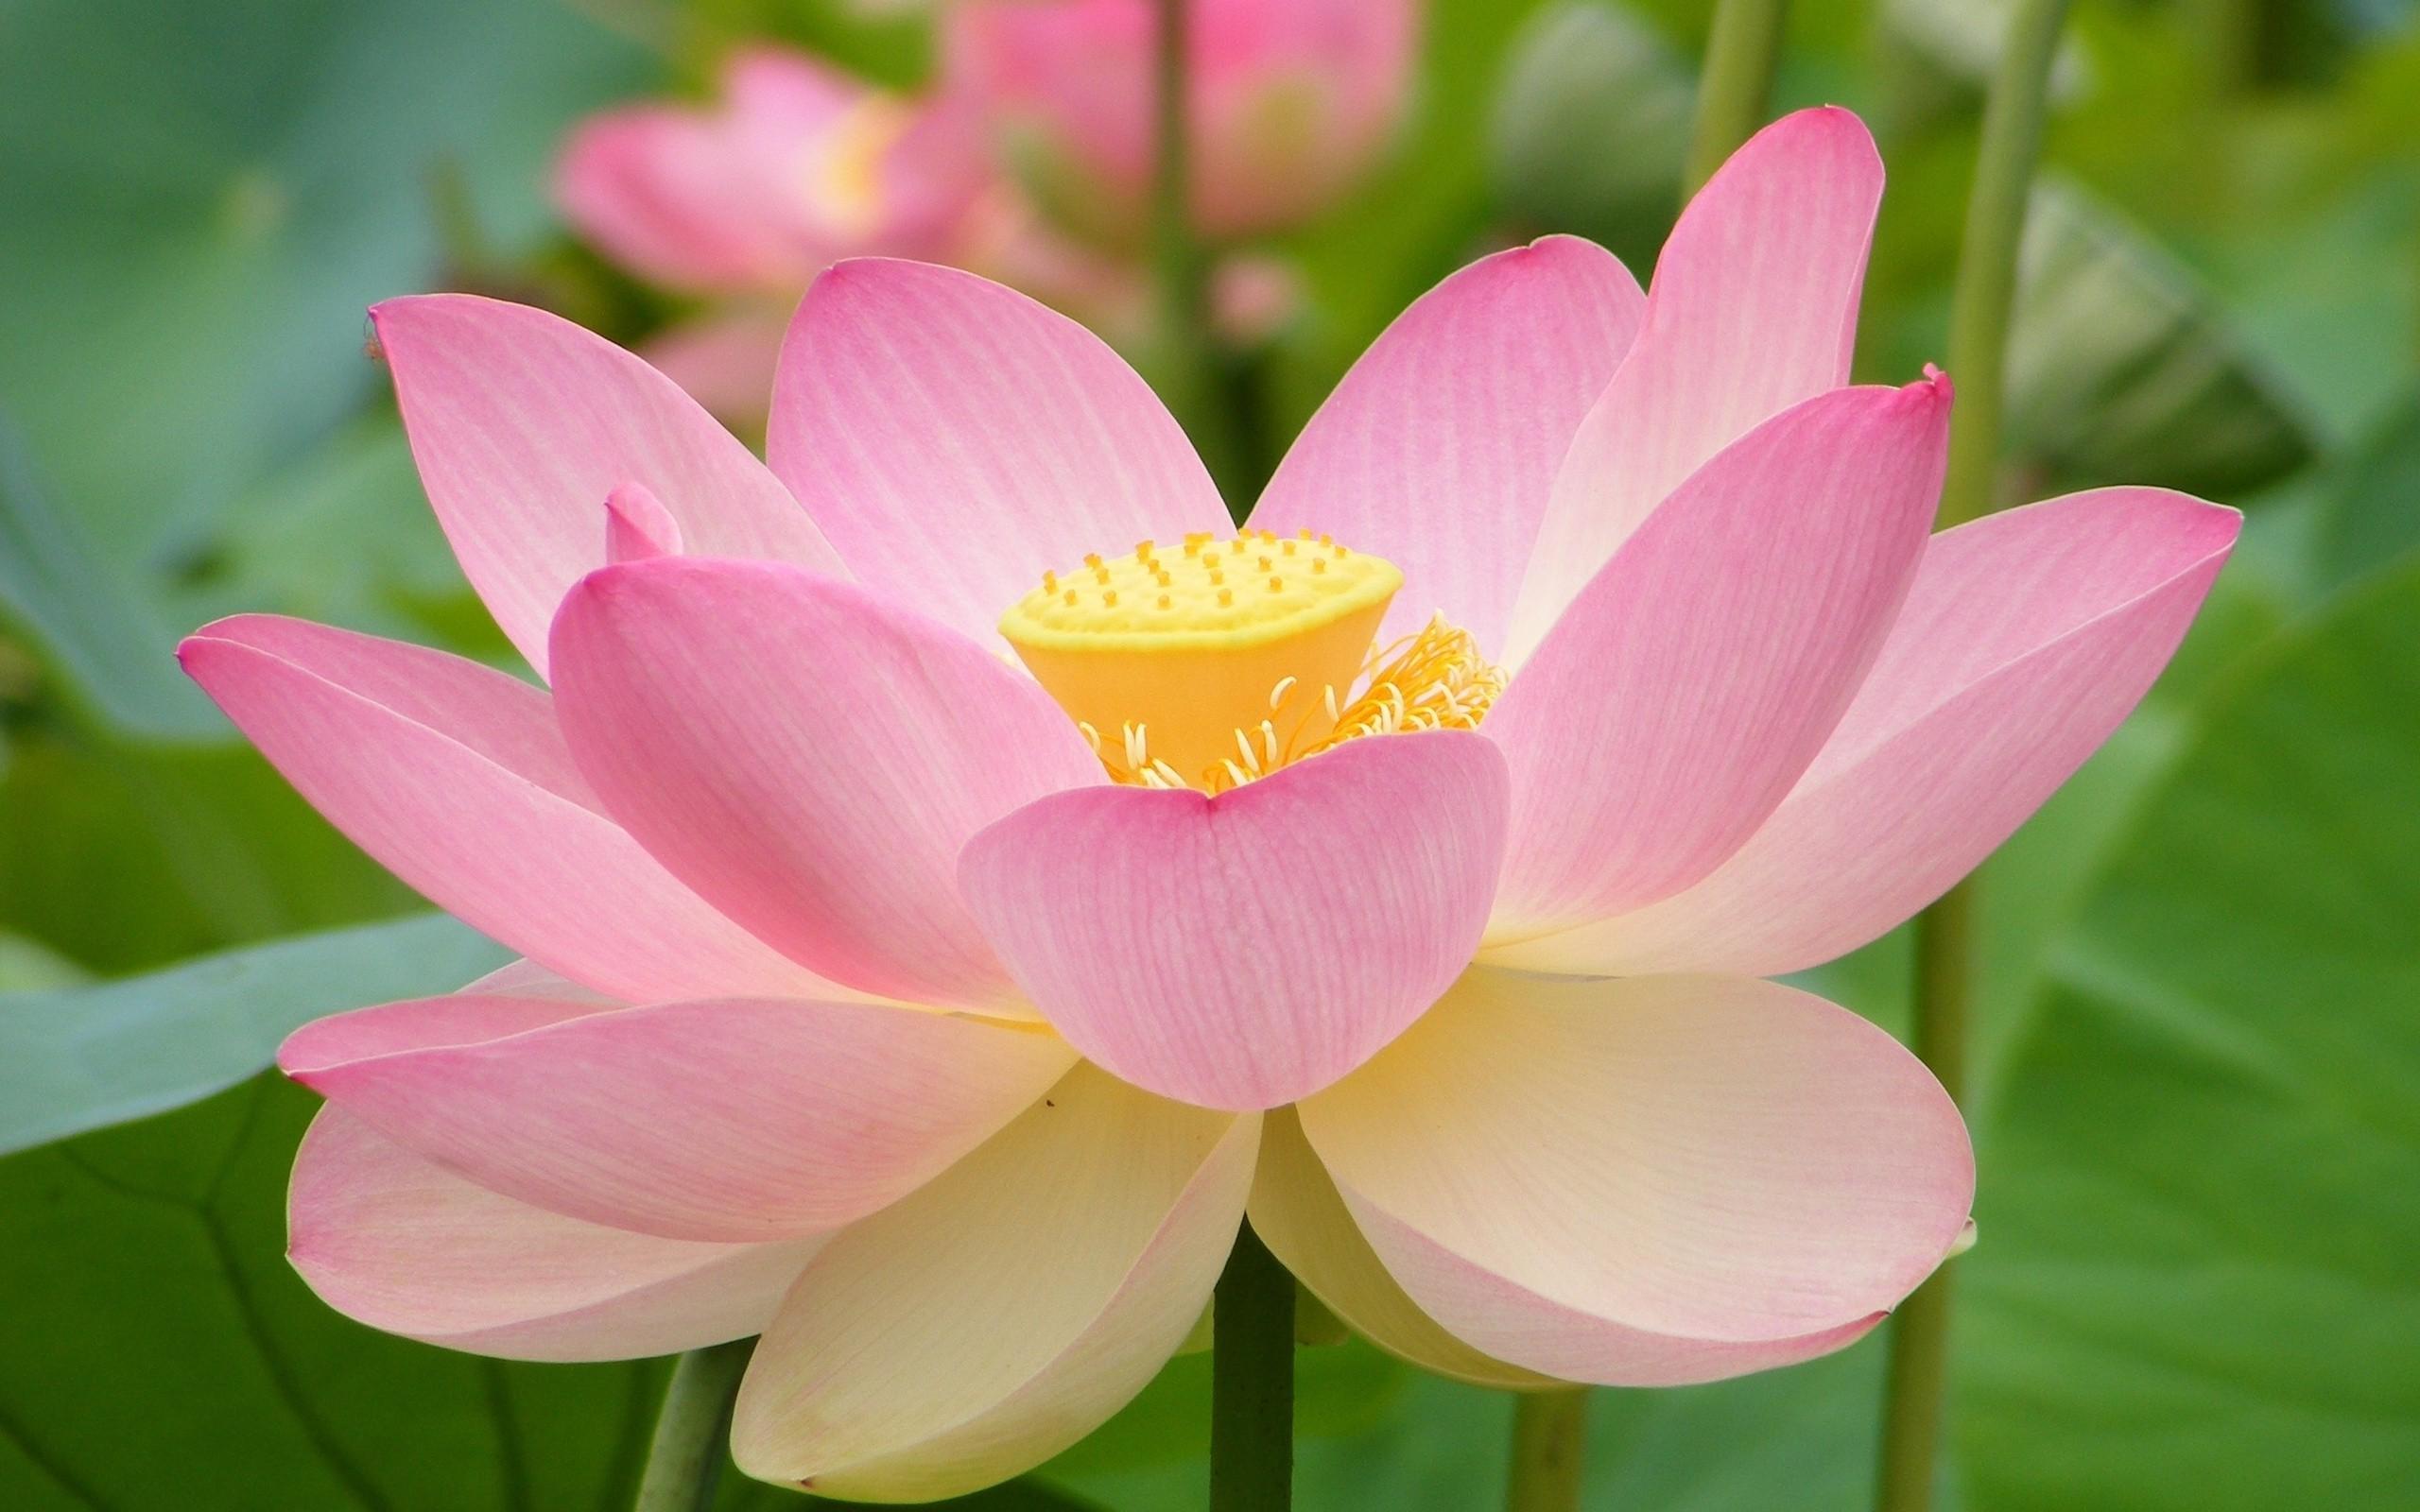 Wallpaper nature pink lotus flowers lotus flower flora petal flowers nature pink lotus flowers lotus flower plant flora petal 2560x1600 px land plant flowering plant izmirmasajfo